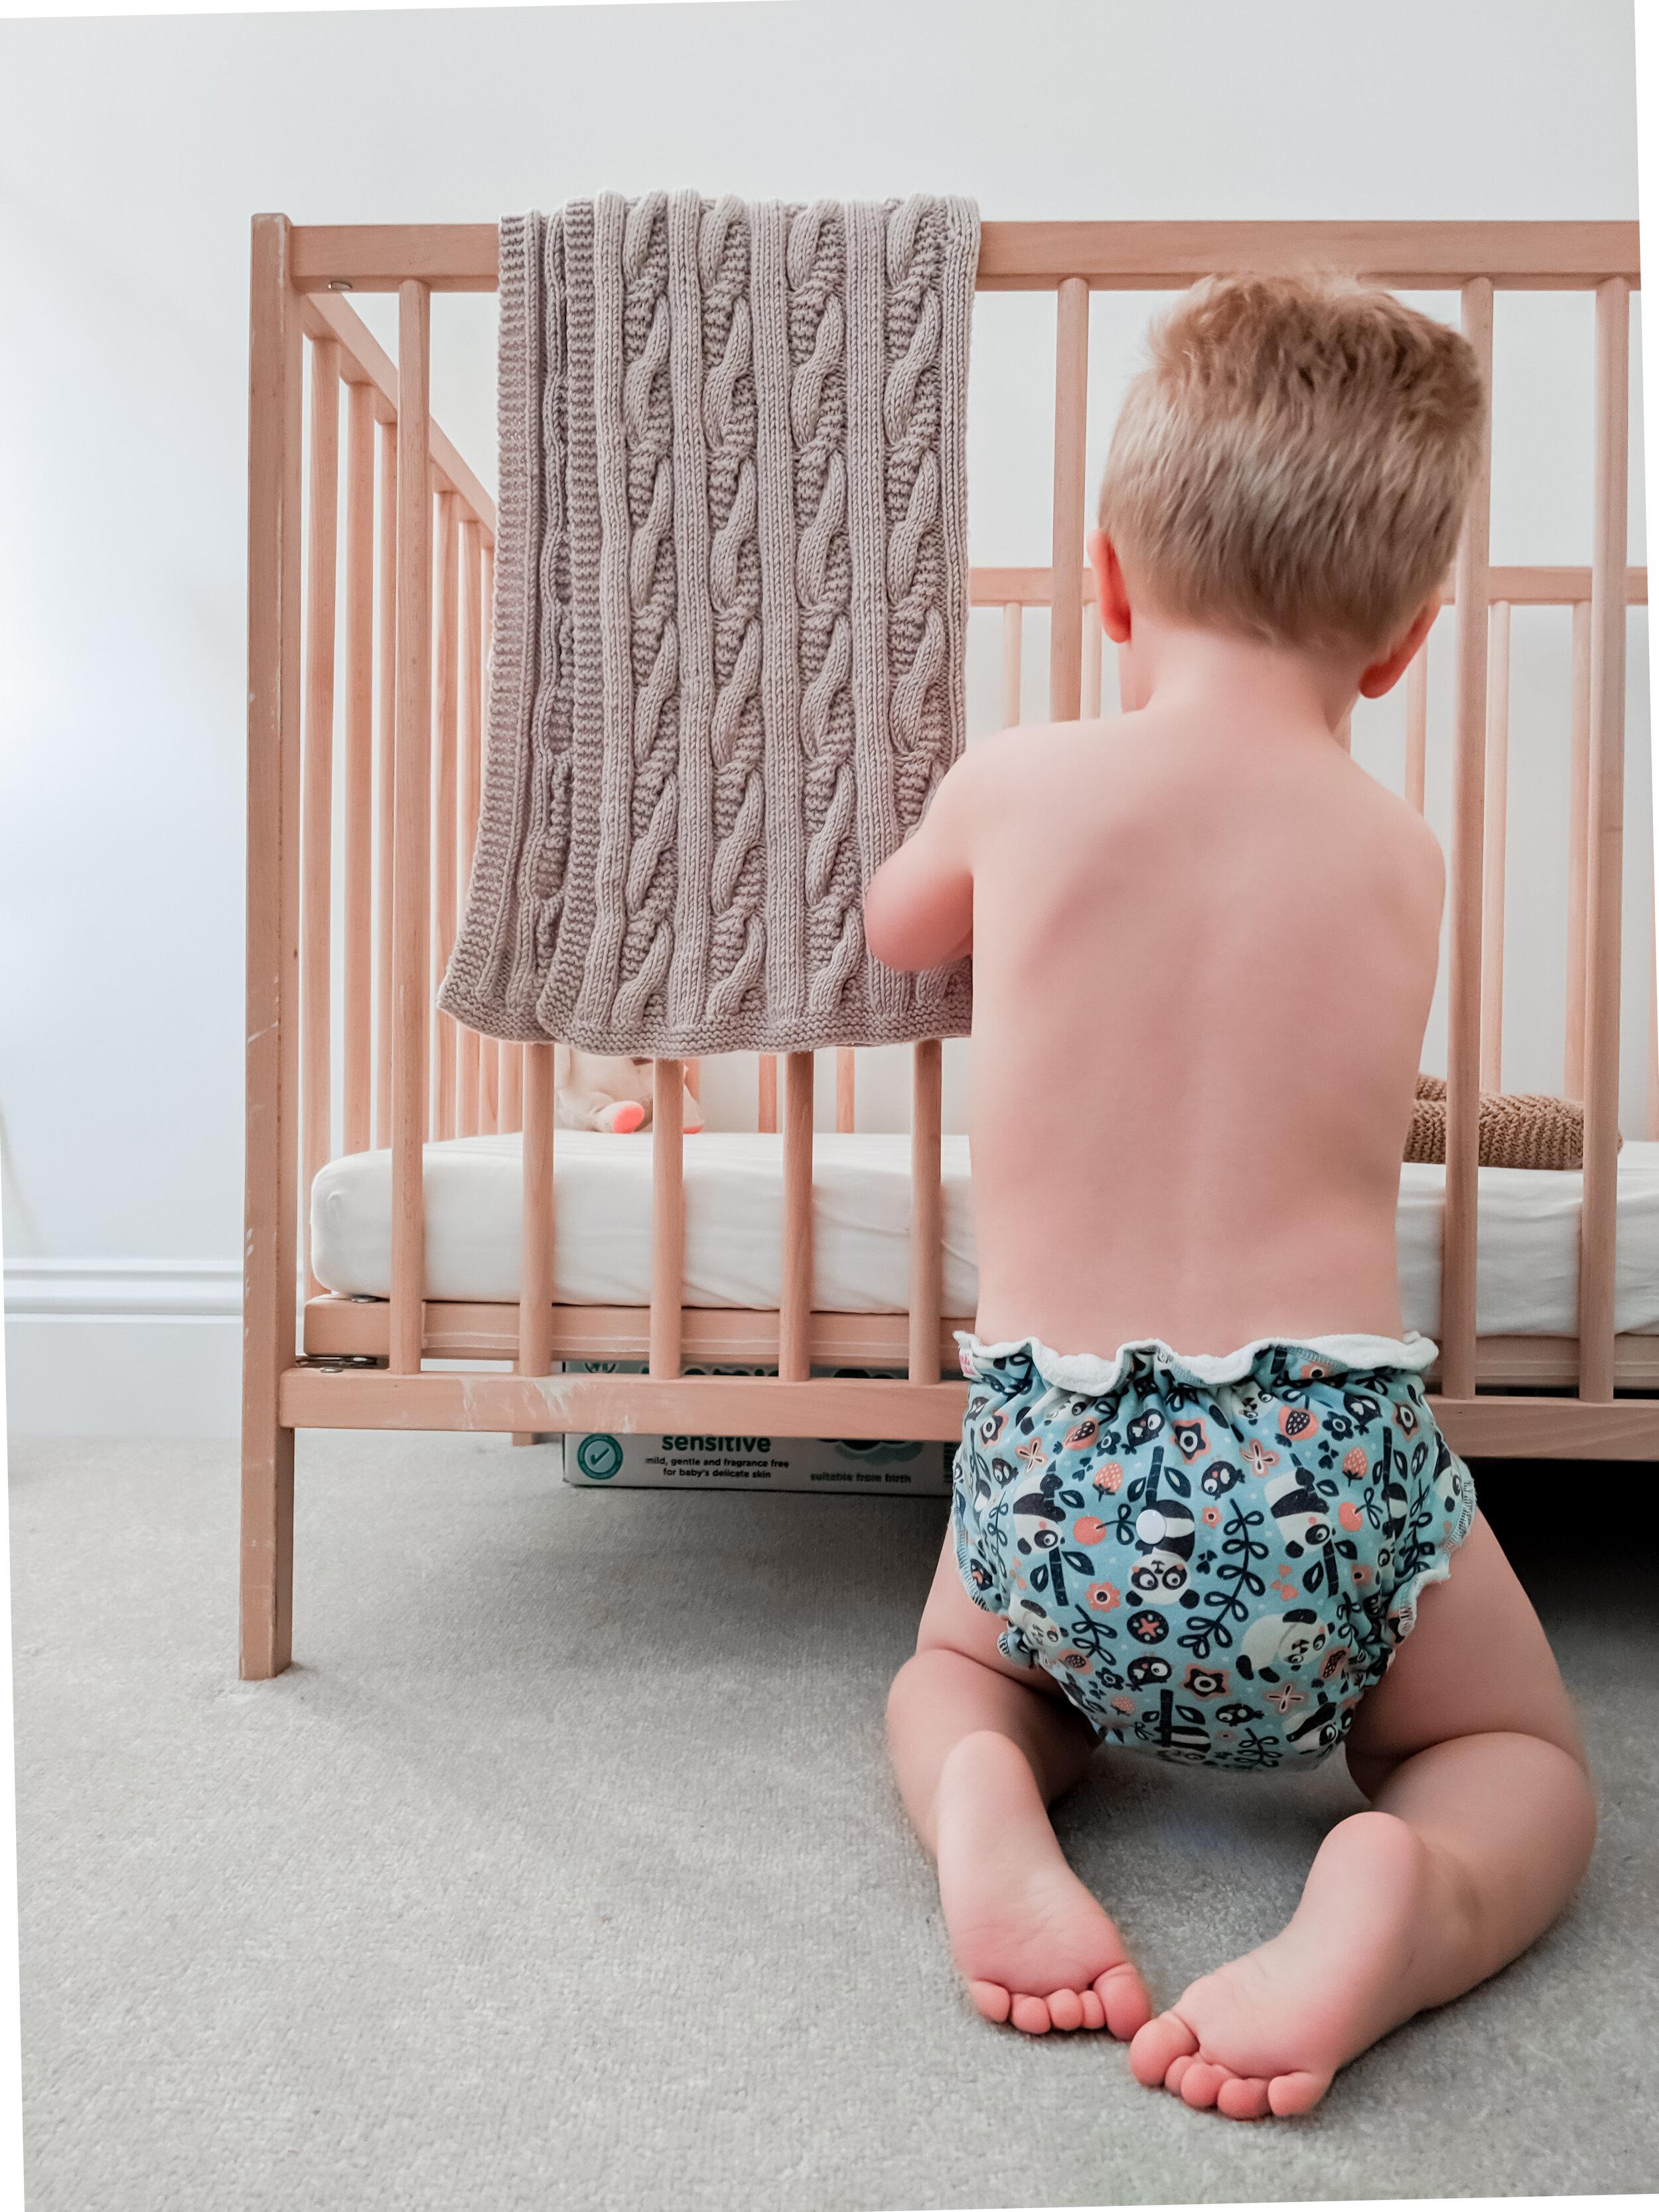 Toddler in Petit Lulu Maxi Night fluffy organic nappy